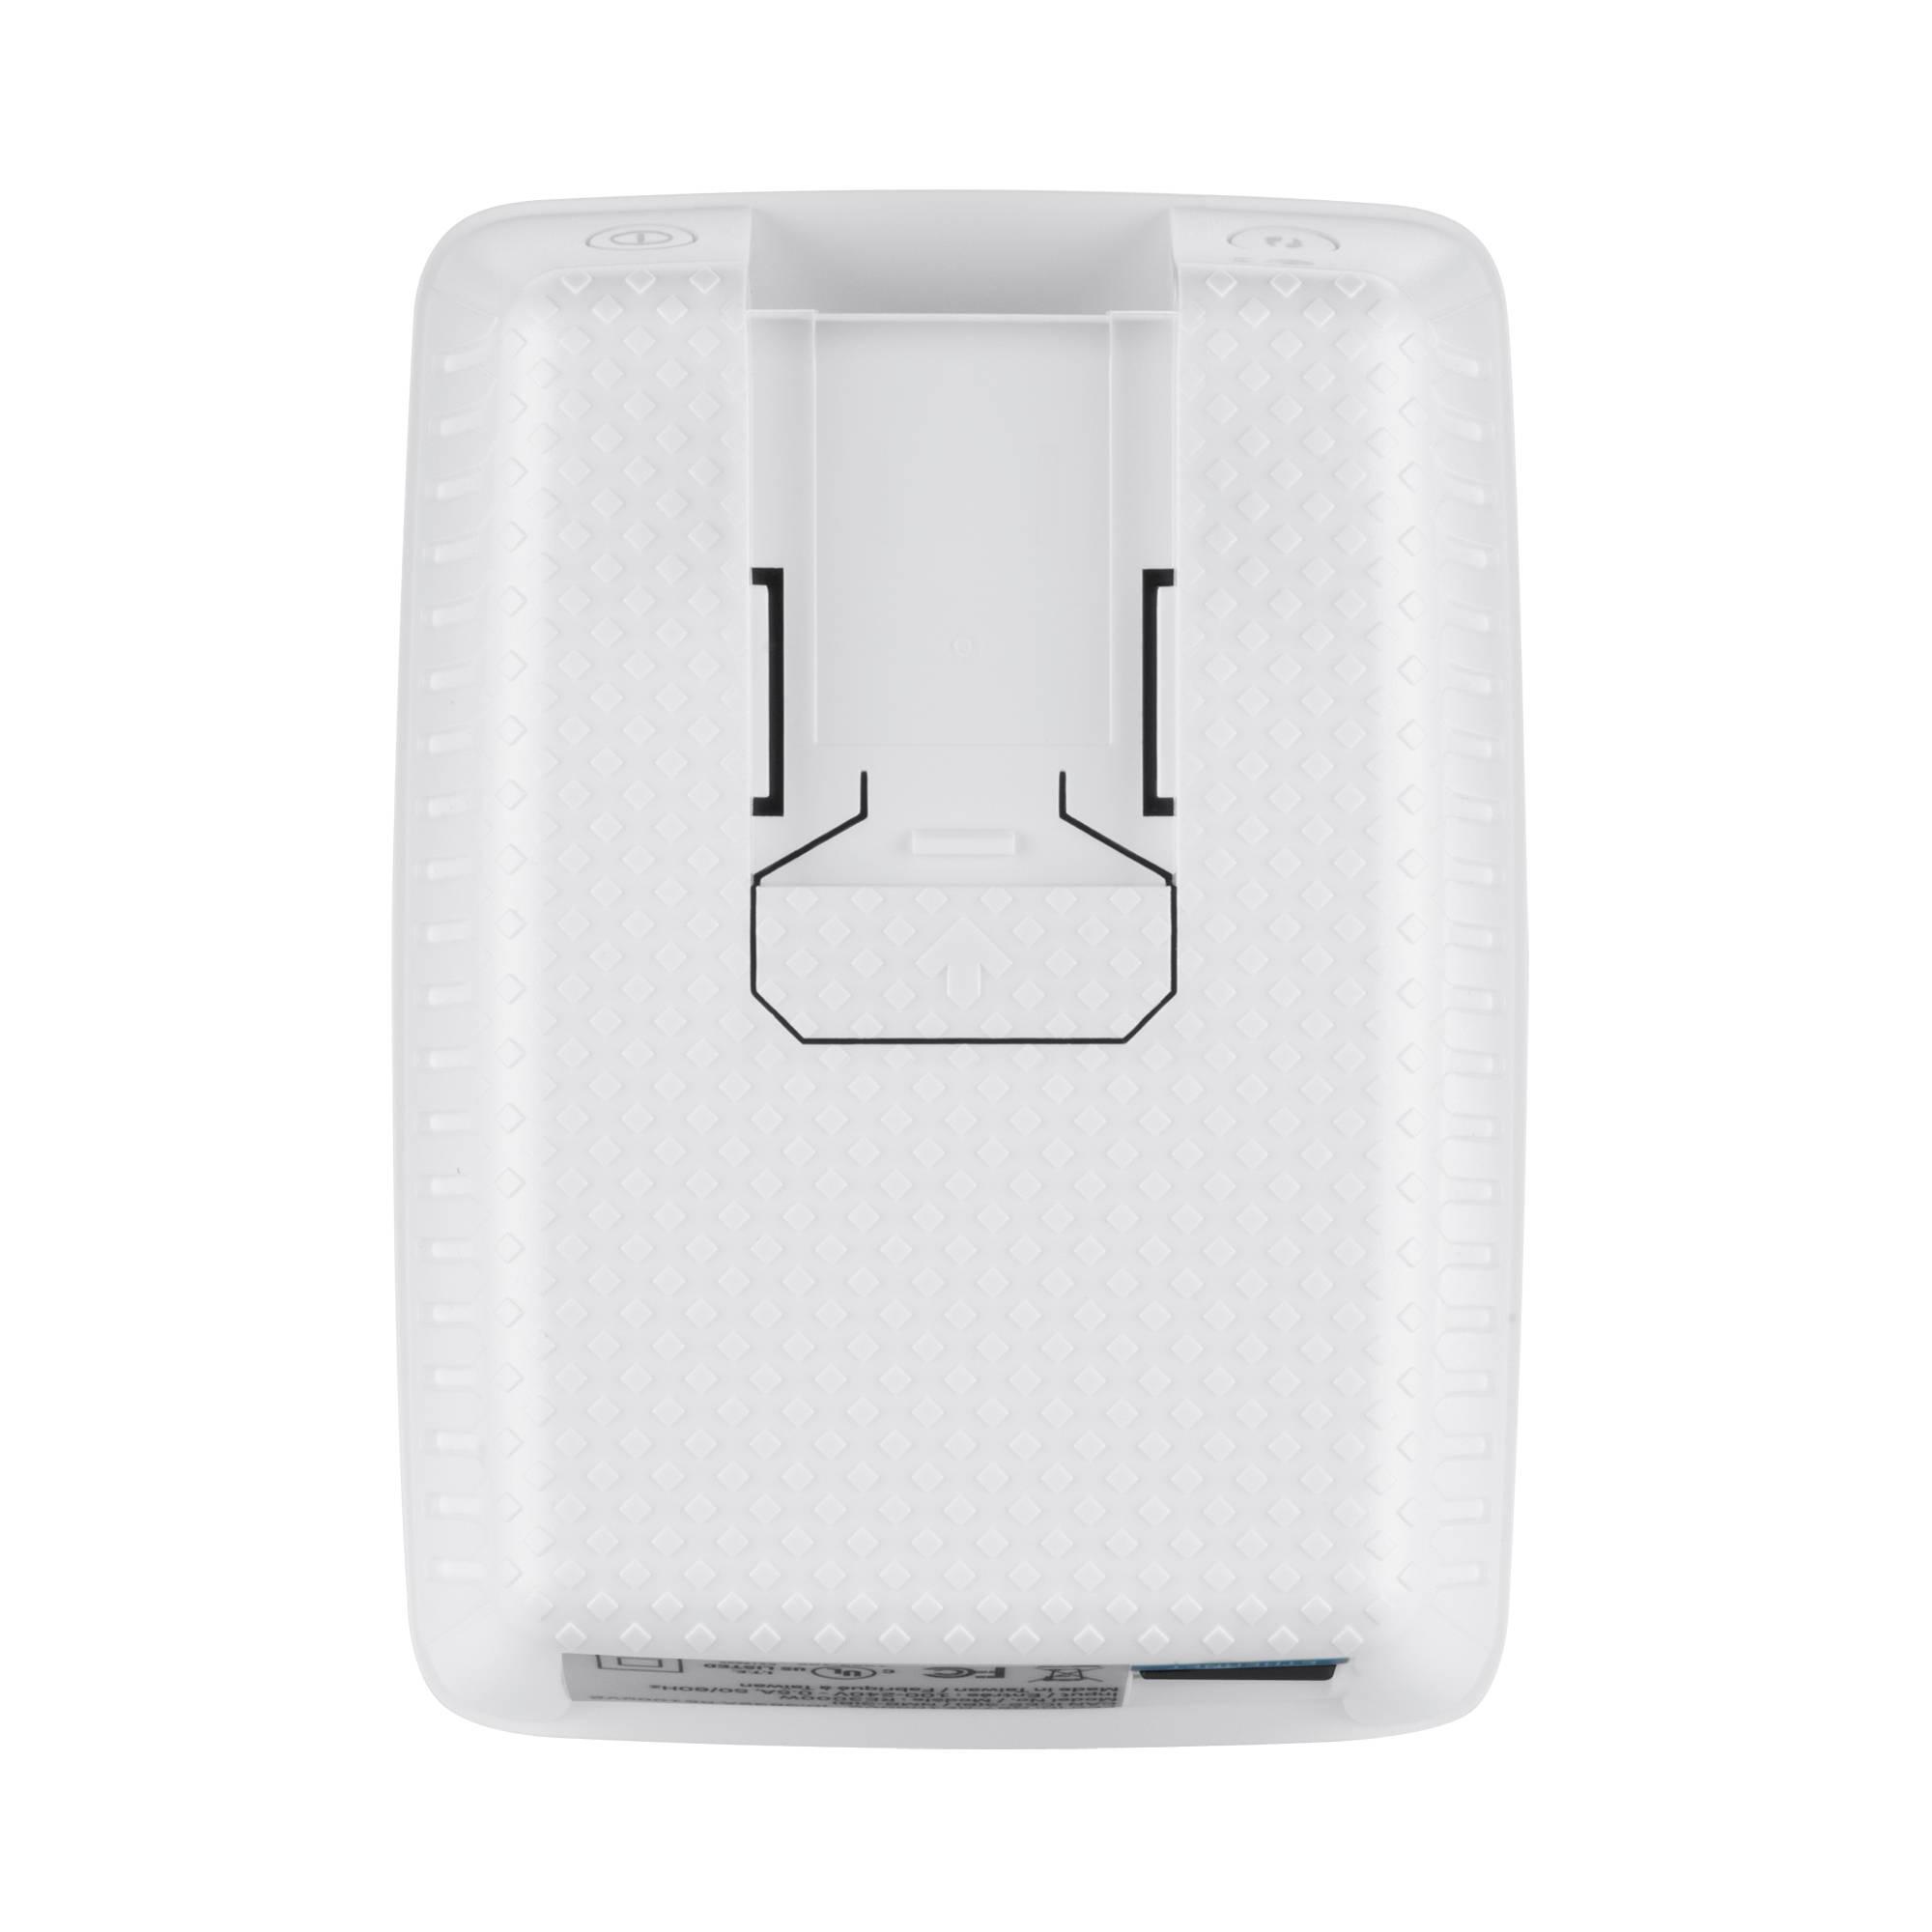 A Linksys RE3000W Wi-Fi Range Extender